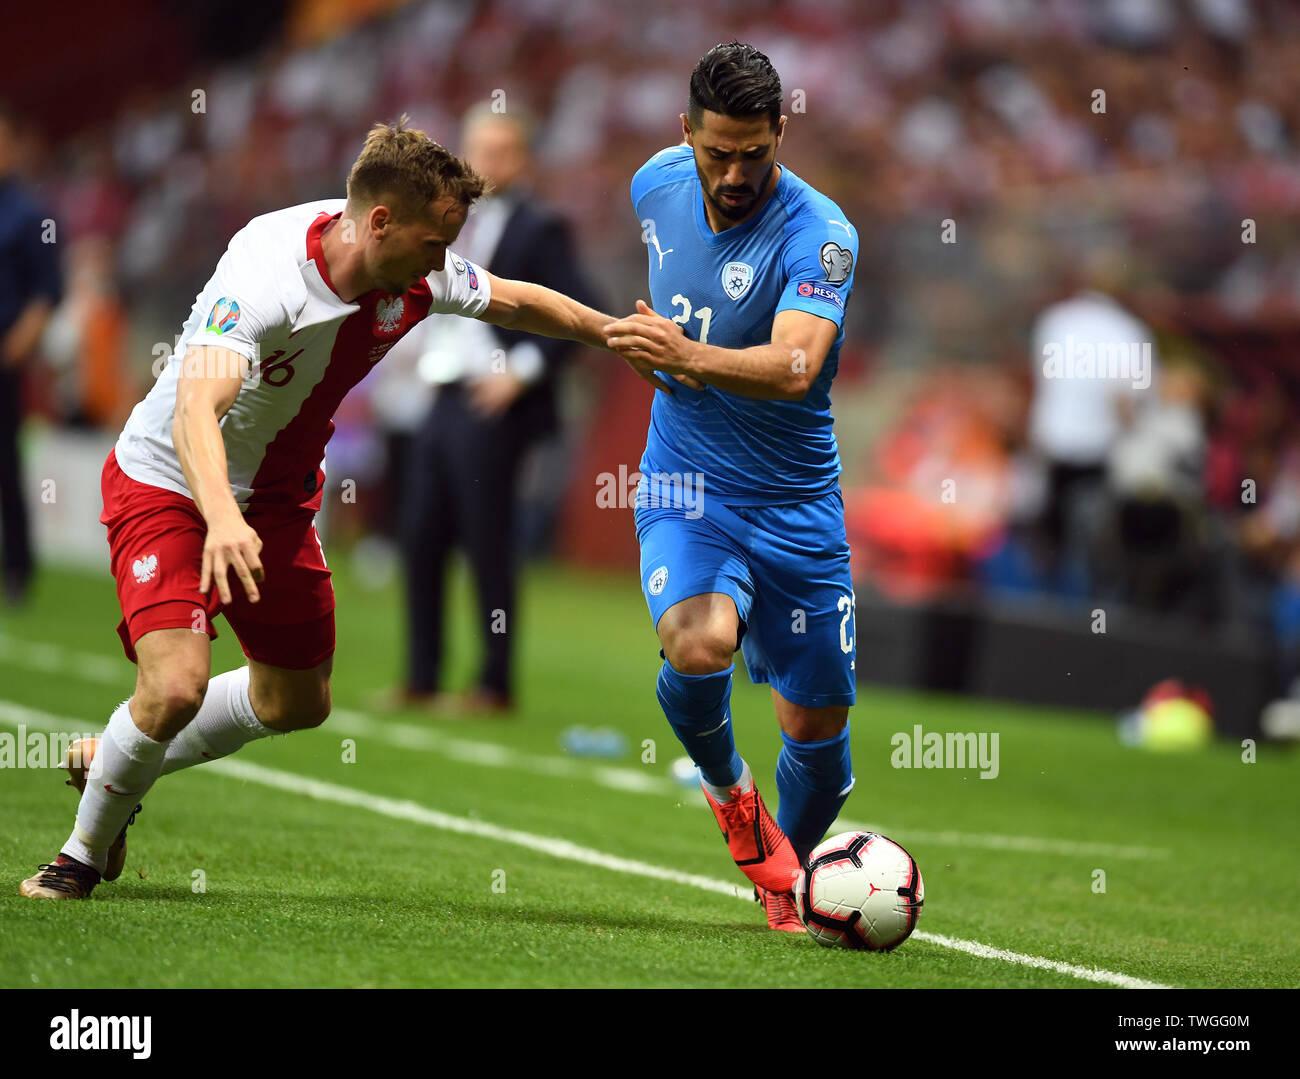 Warsaw, Poland, June 10, 2019: EURO 2020 qualifing round, group stage, Poland wins 4:0 with Izarel on PGE Narodowy. Tomasz Kedziora (Poland) Beram Kayal (Izrael) - Stock Image